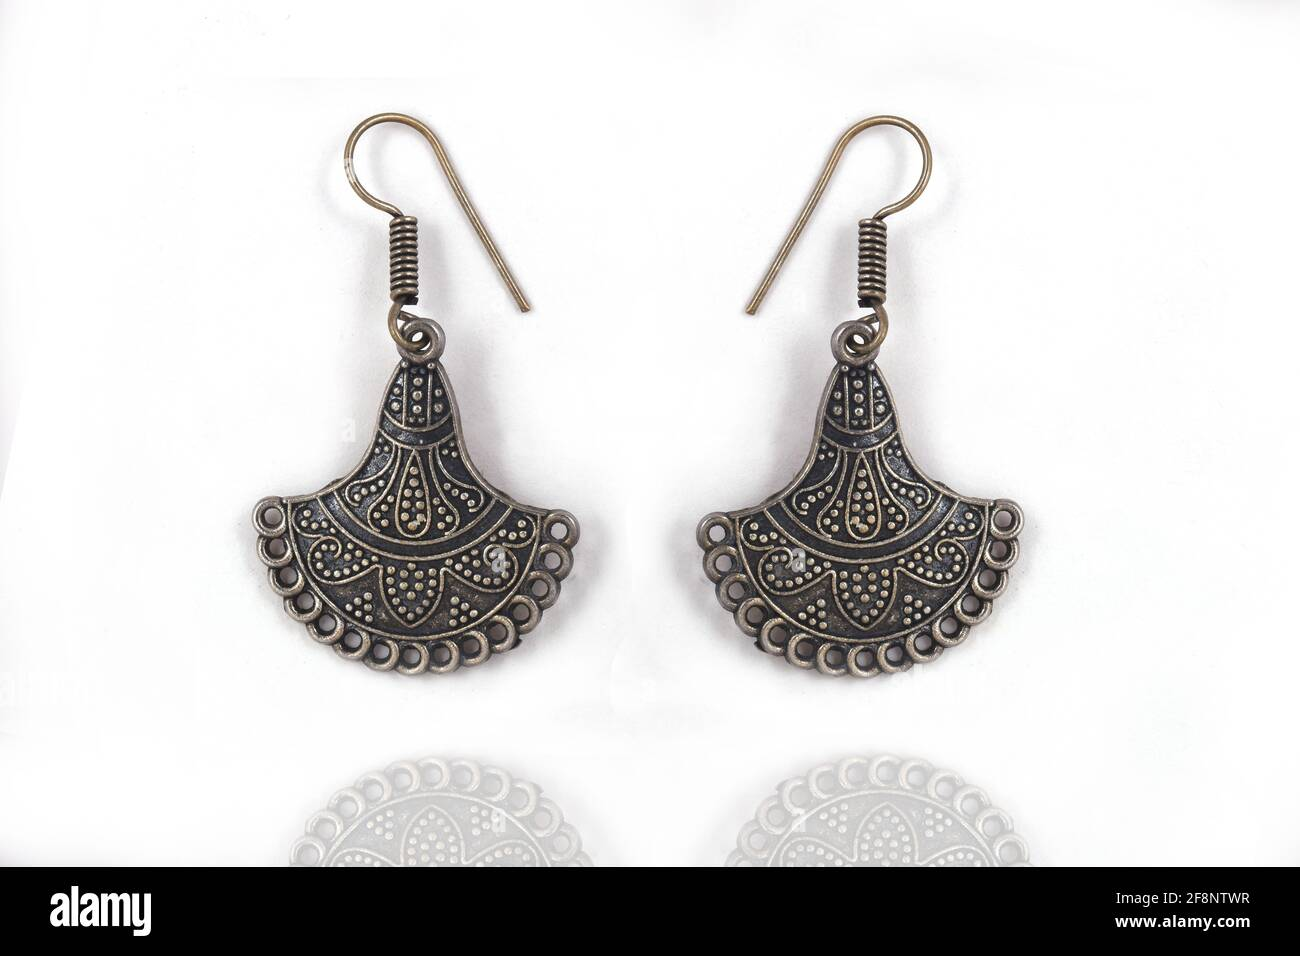 Hermosos pendientes de plata oriental joyas (India, árabe, africano, egipcio), pendientes de plata oxidada, Moda Exótica Asia Accesorios Foto de stock